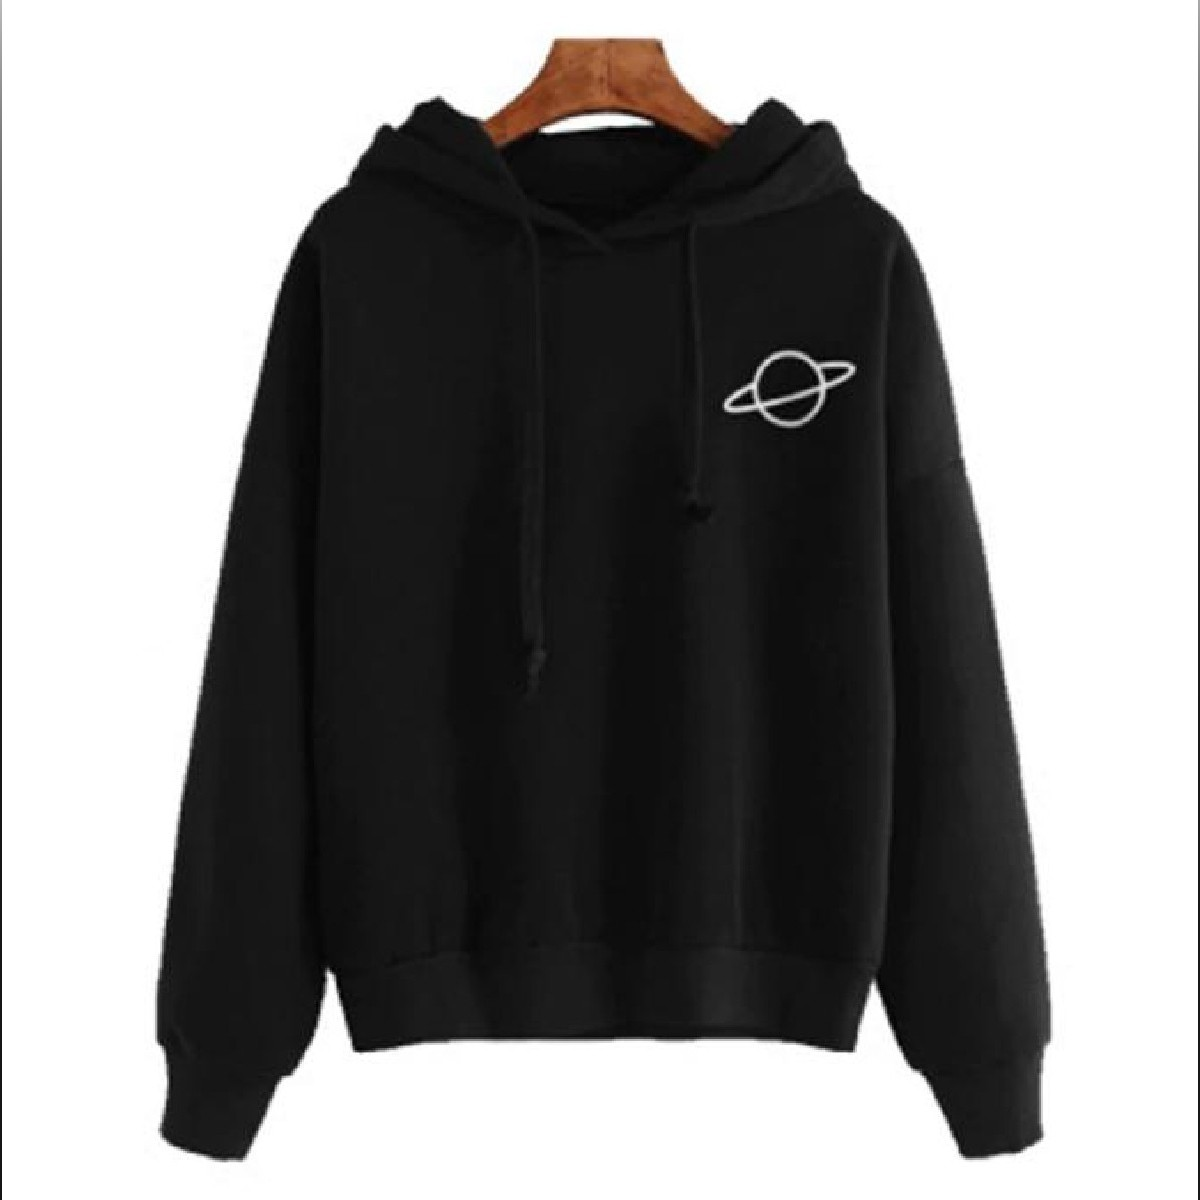 Jack Beos Women Hoodies Casual Kpop Planet Print Solid Loose Drawstring Sweatshirt Long Sleeve Hooded Autumn Female Pullover